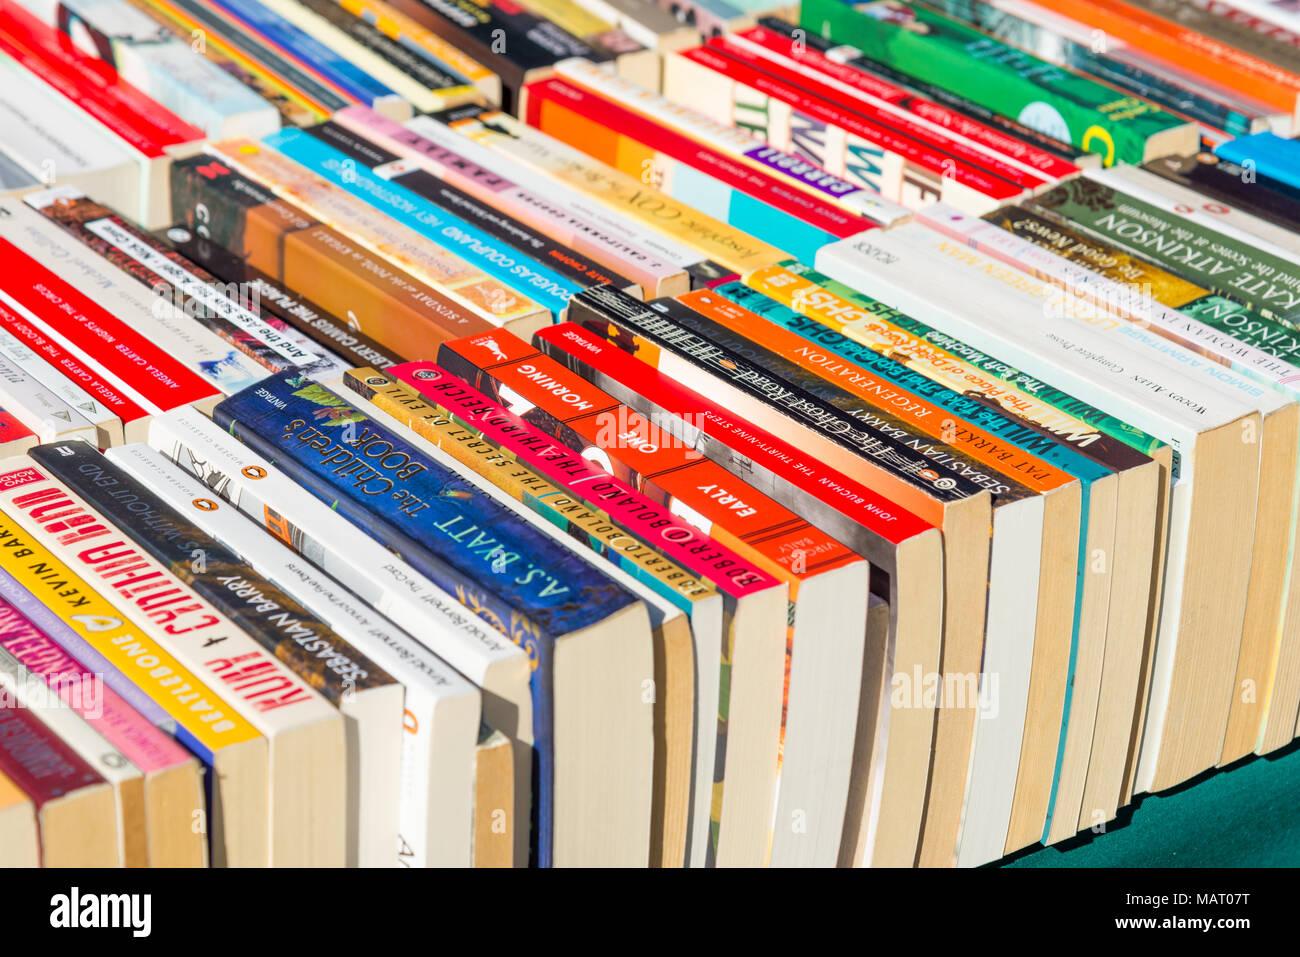 Paperback books for sale on market stall, UK - Stock Image